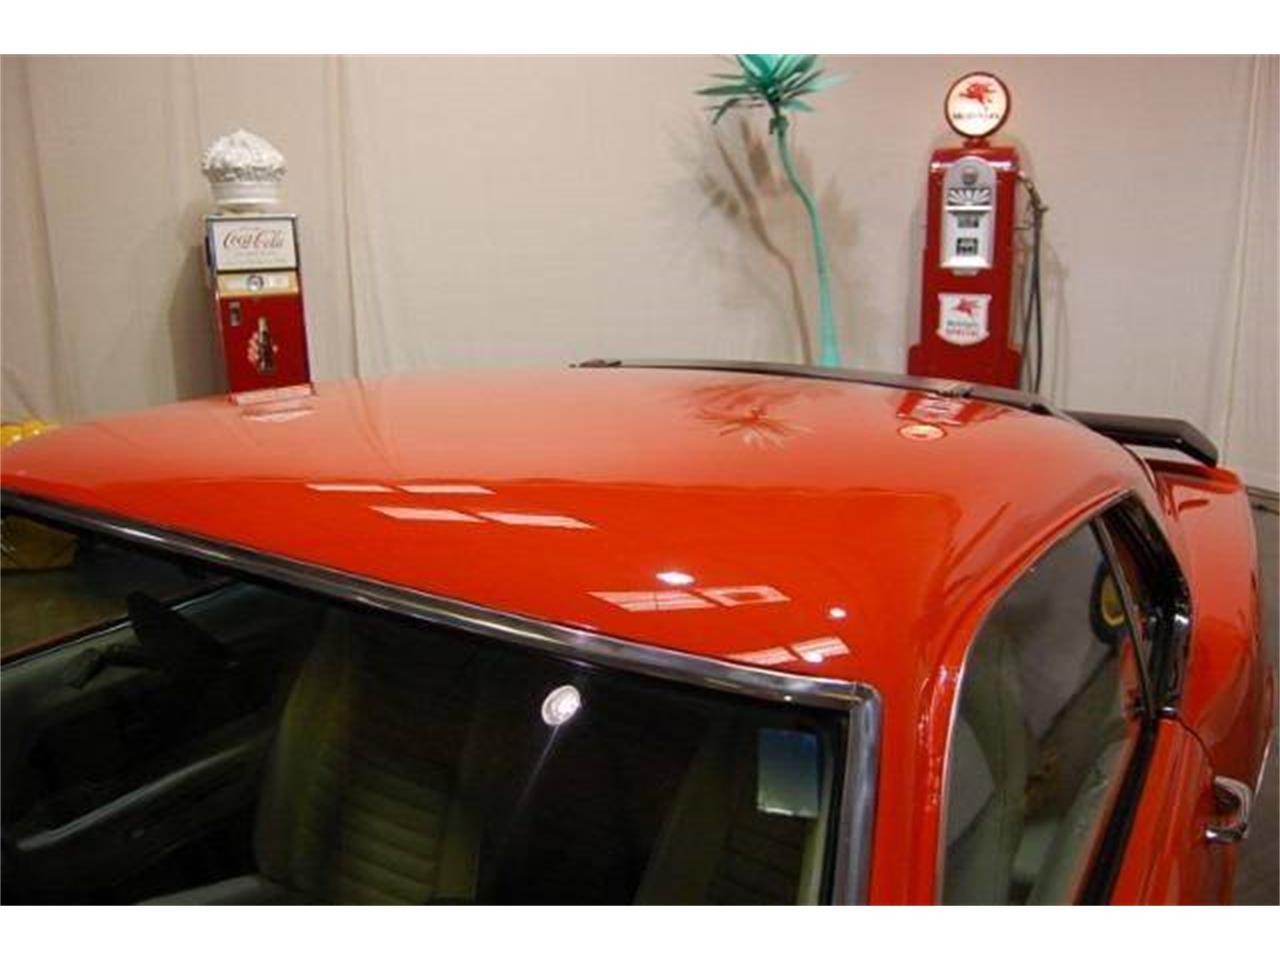 1970 Ford Mustang Mach 1 (CC-1271348) for sale in Marietta, Georgia